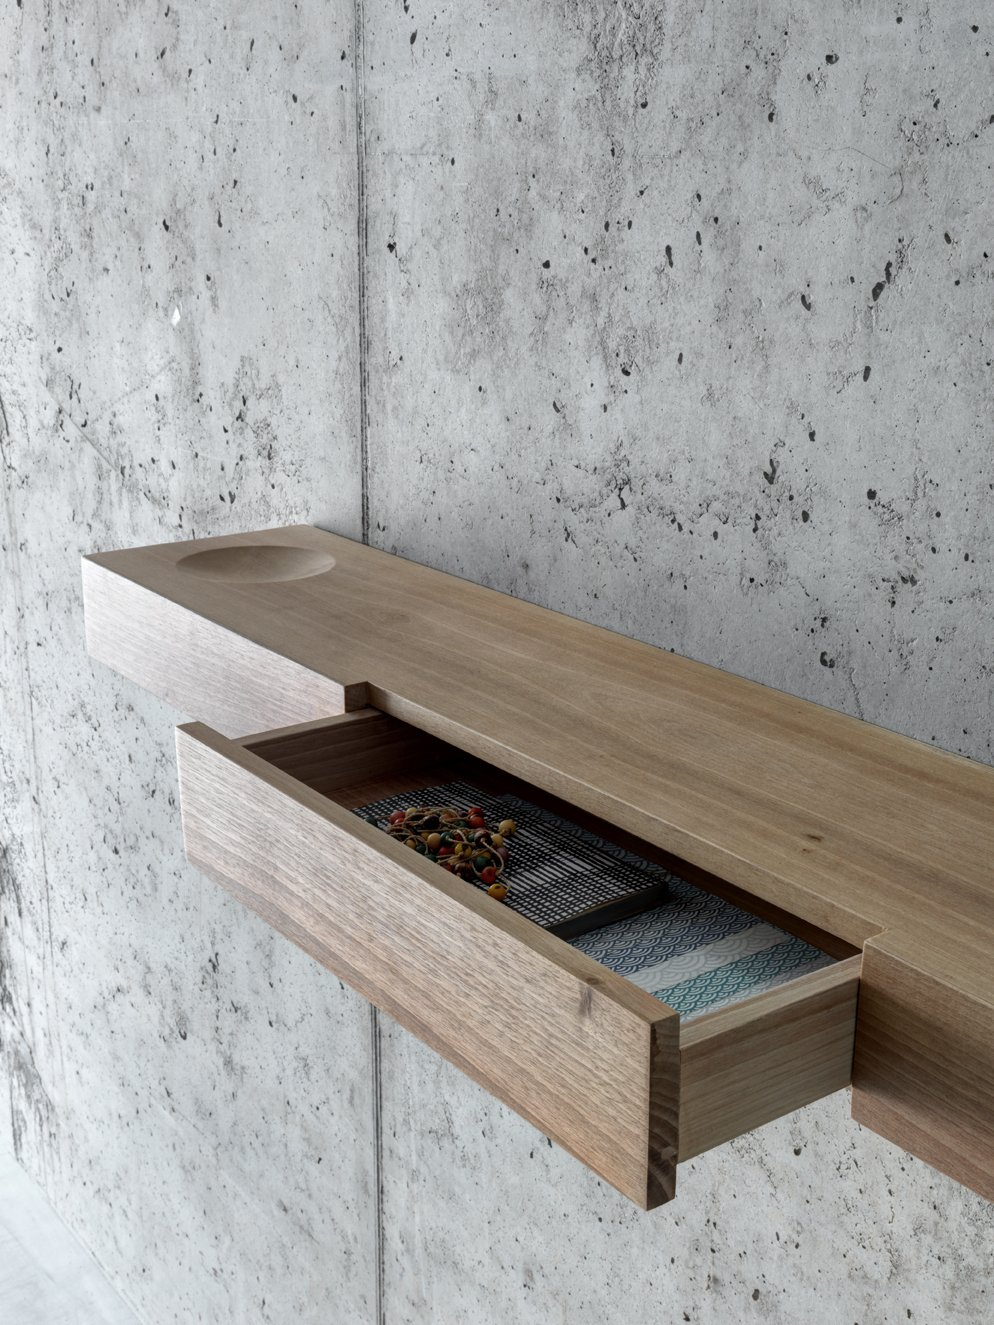 walnut wall shelf b u00c0uti by fioroni design pasquini tranfa walnut wall mounted shelves walnut wall mounted shelves